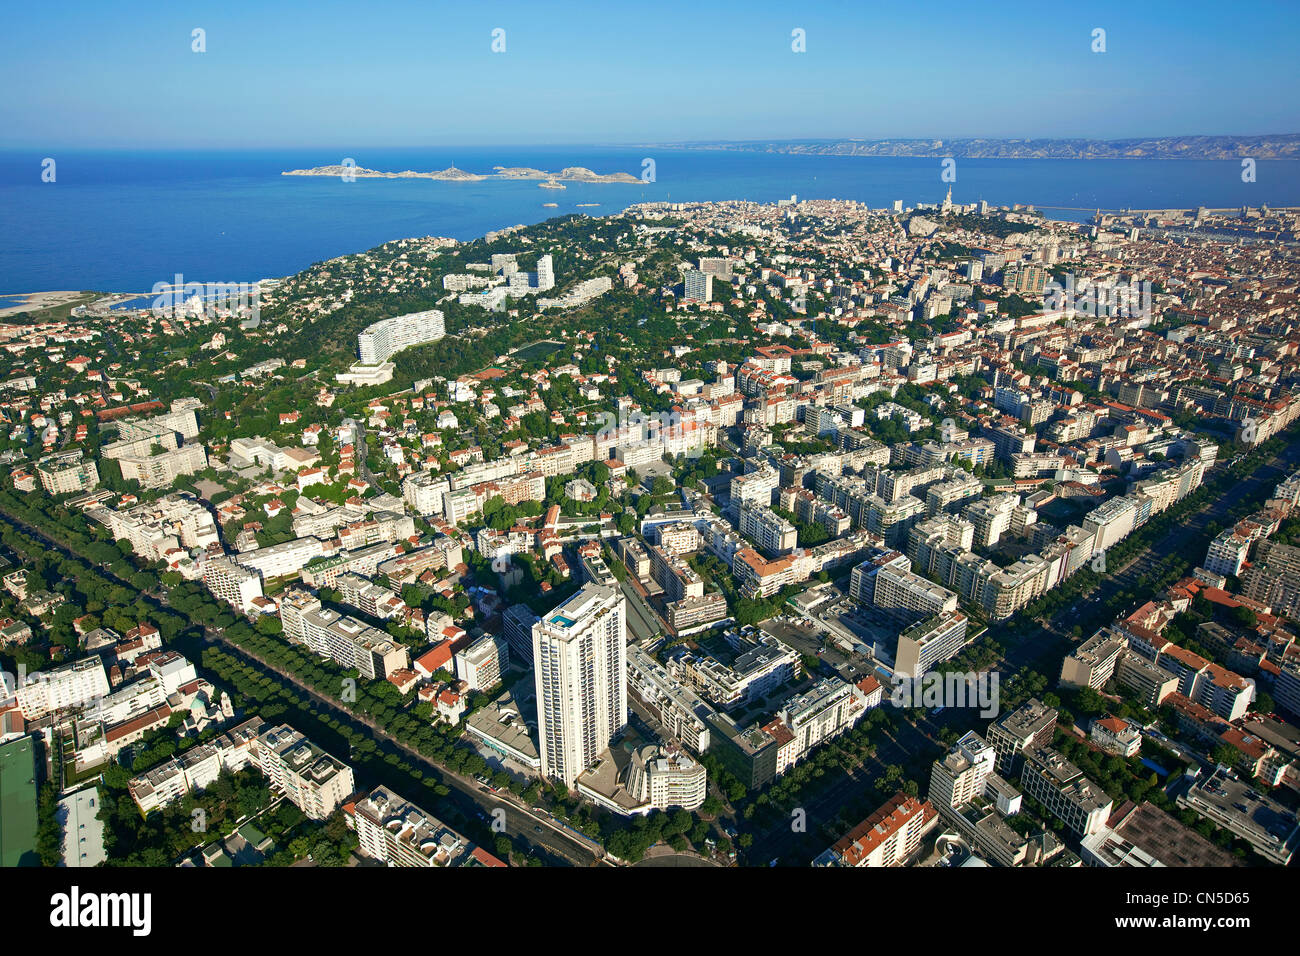 France bouches du rhone marseille 8th district rond point du stock photo royalty free image - Monoprix rond point du prado ...